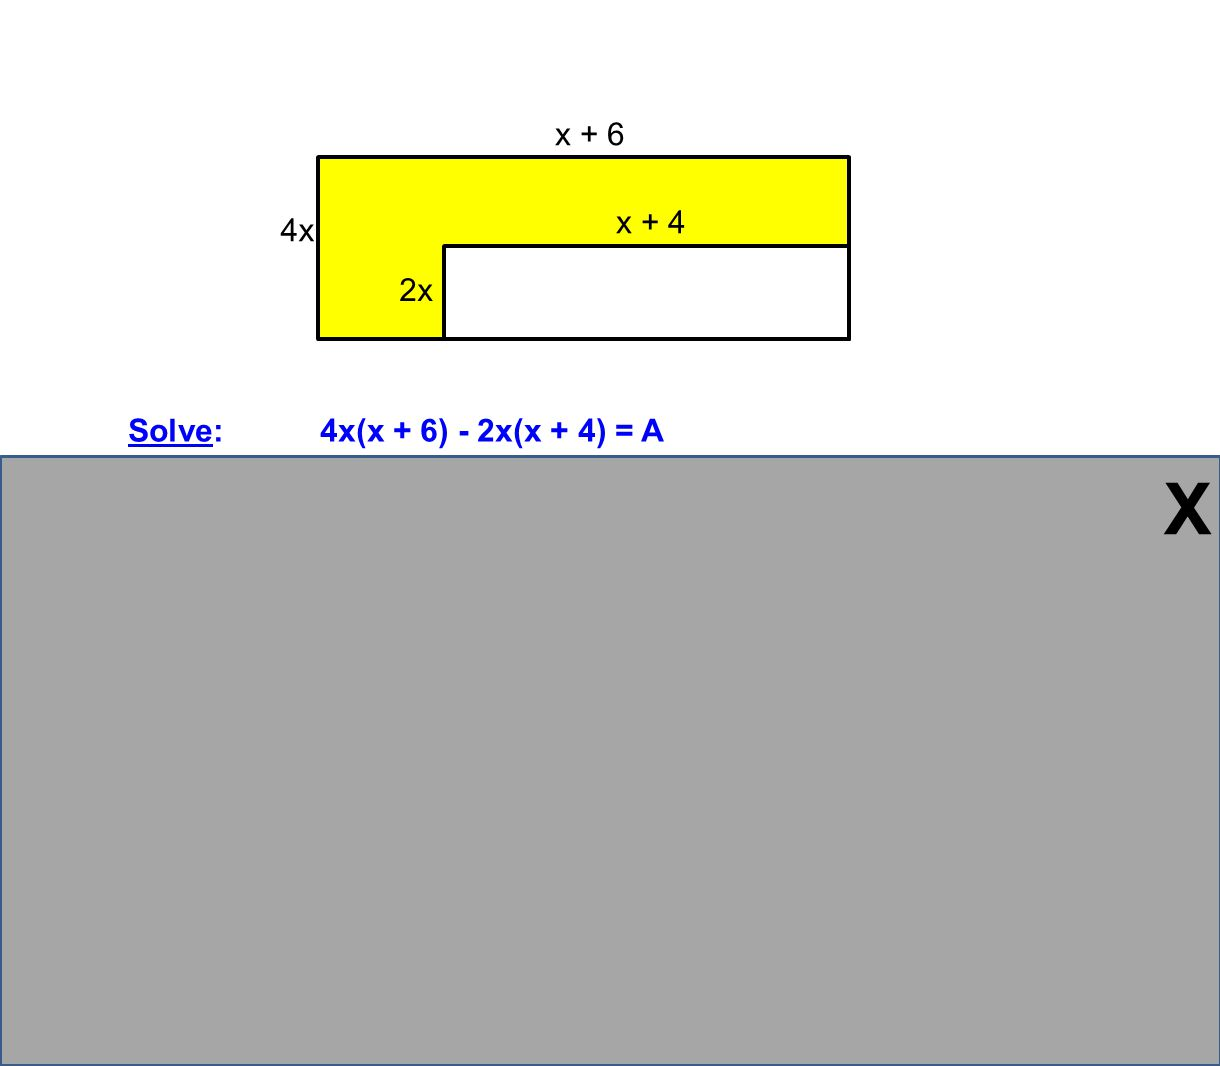 Solve: 4x(x + 6) - 2x(x + 4) = A 4x 2 + 24x - 2x 2 - 8x = A 2x 2 + 16x = A The area of the shaded region is (2x 2 + 16x) units 2 Check: x + 6 x + 4 2x